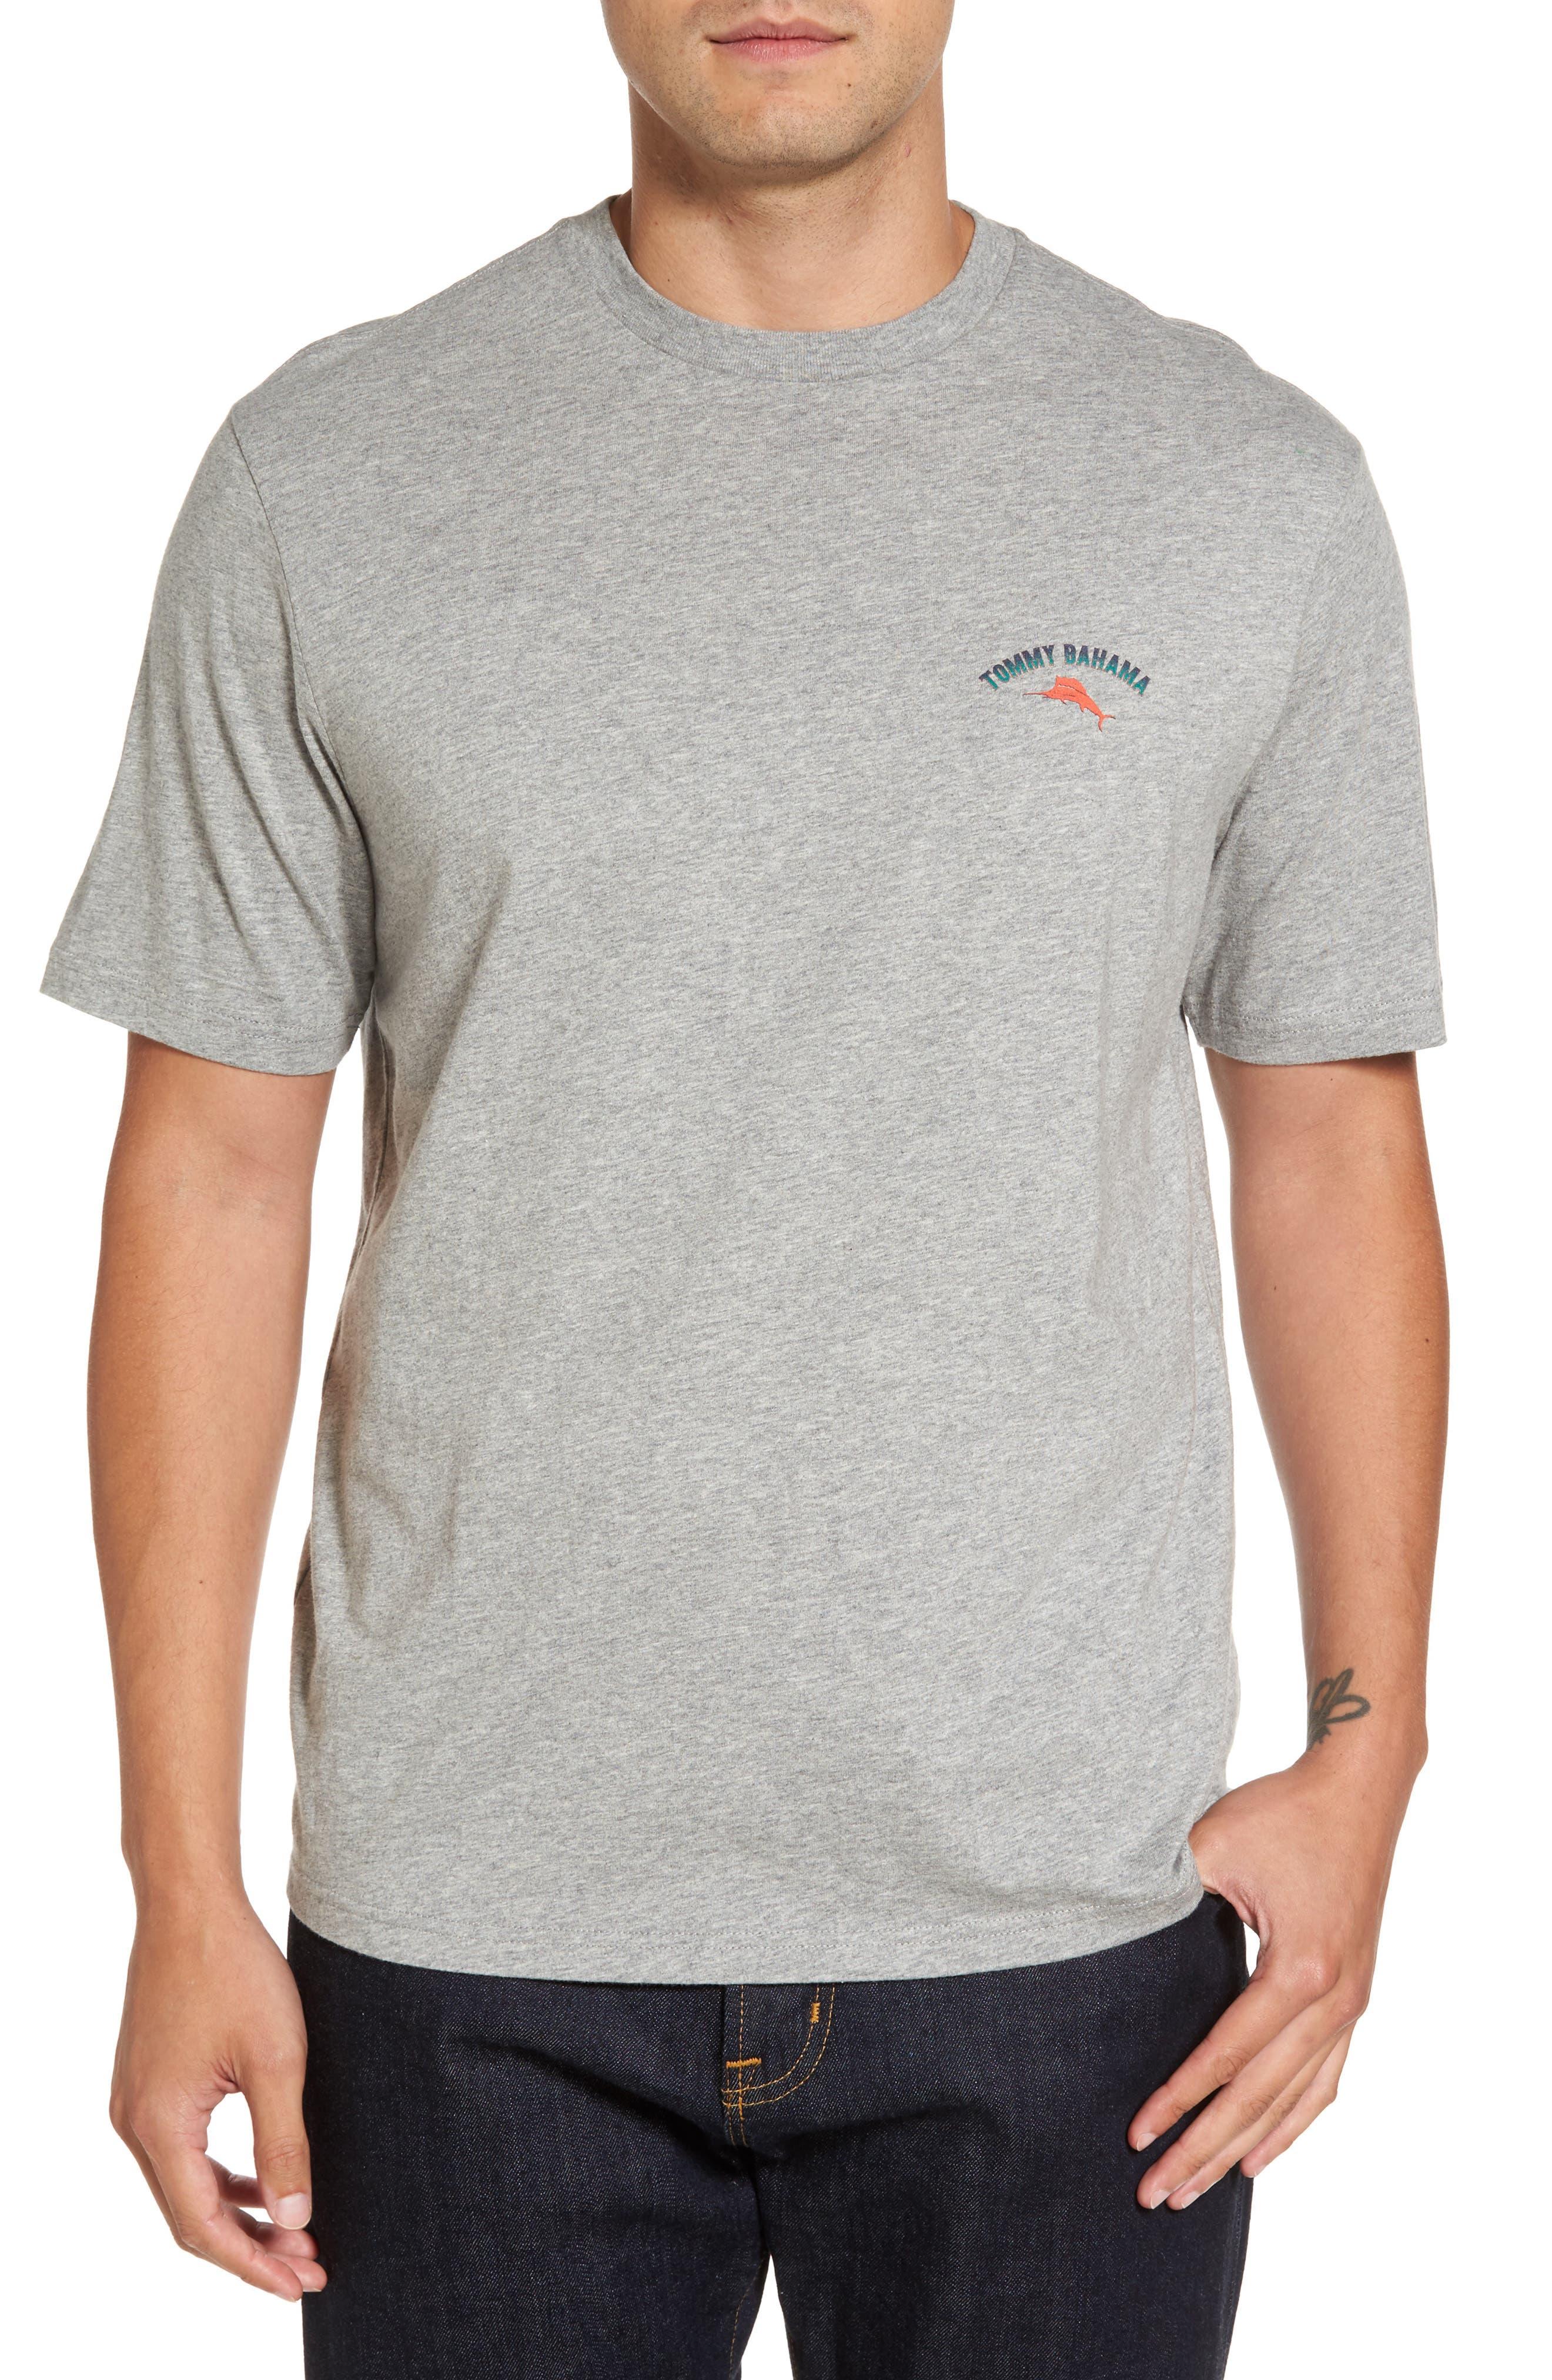 Alternate Image 1 Selected - Tommy Bahama Outside Limebacker Standard Fit T-Shirt